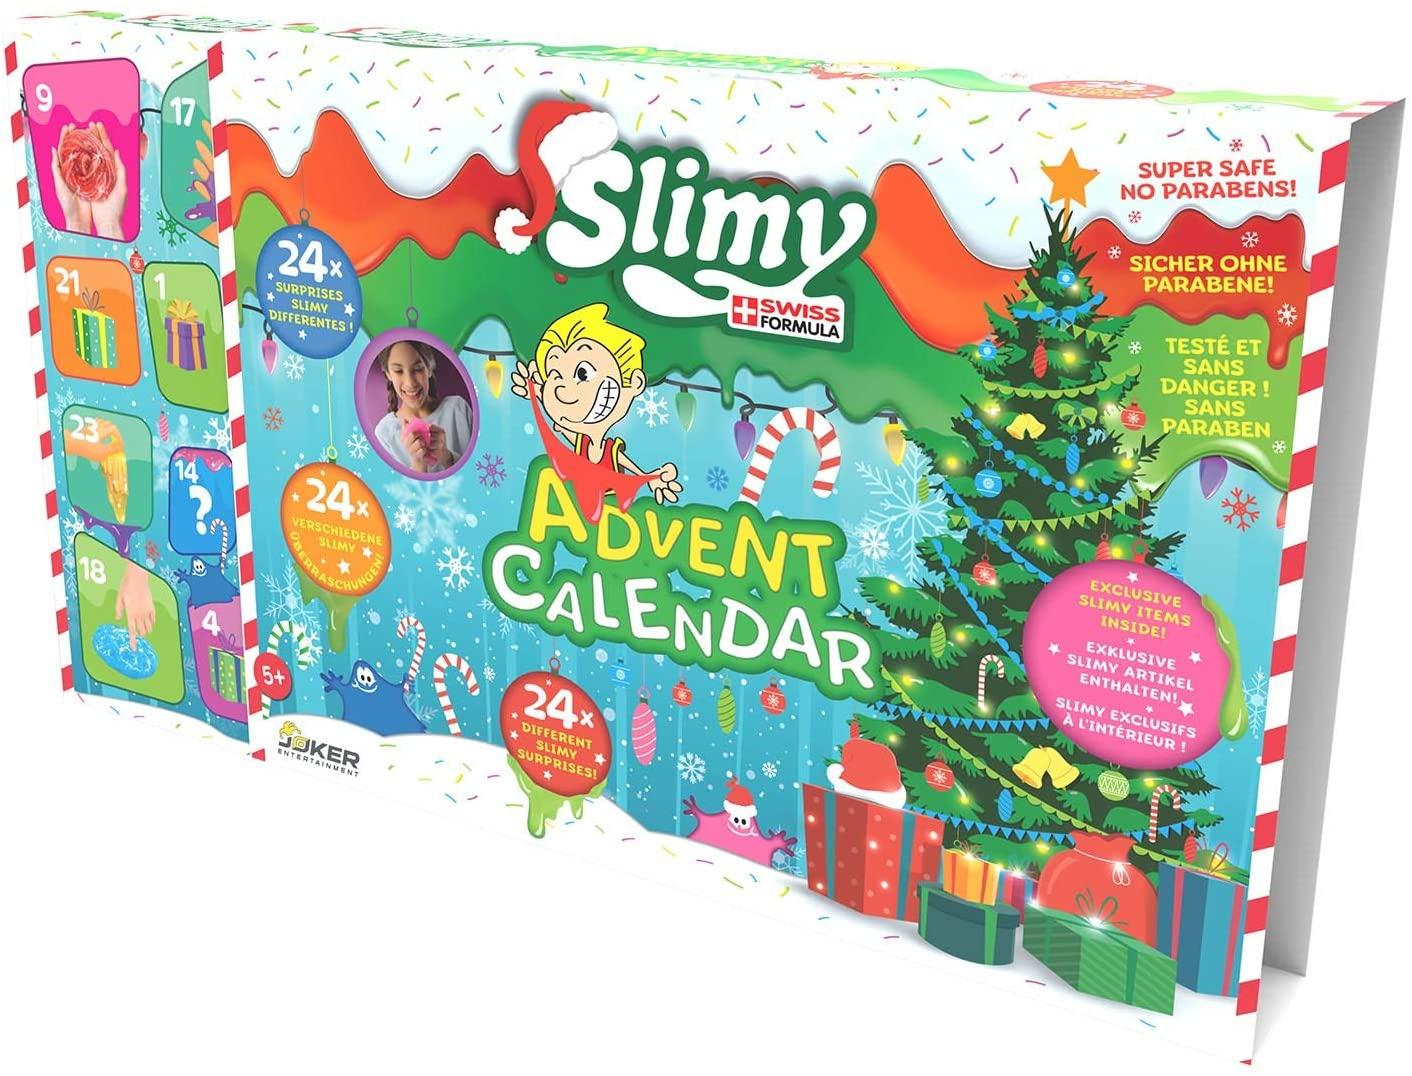 Slimy Advent Calendar 2020